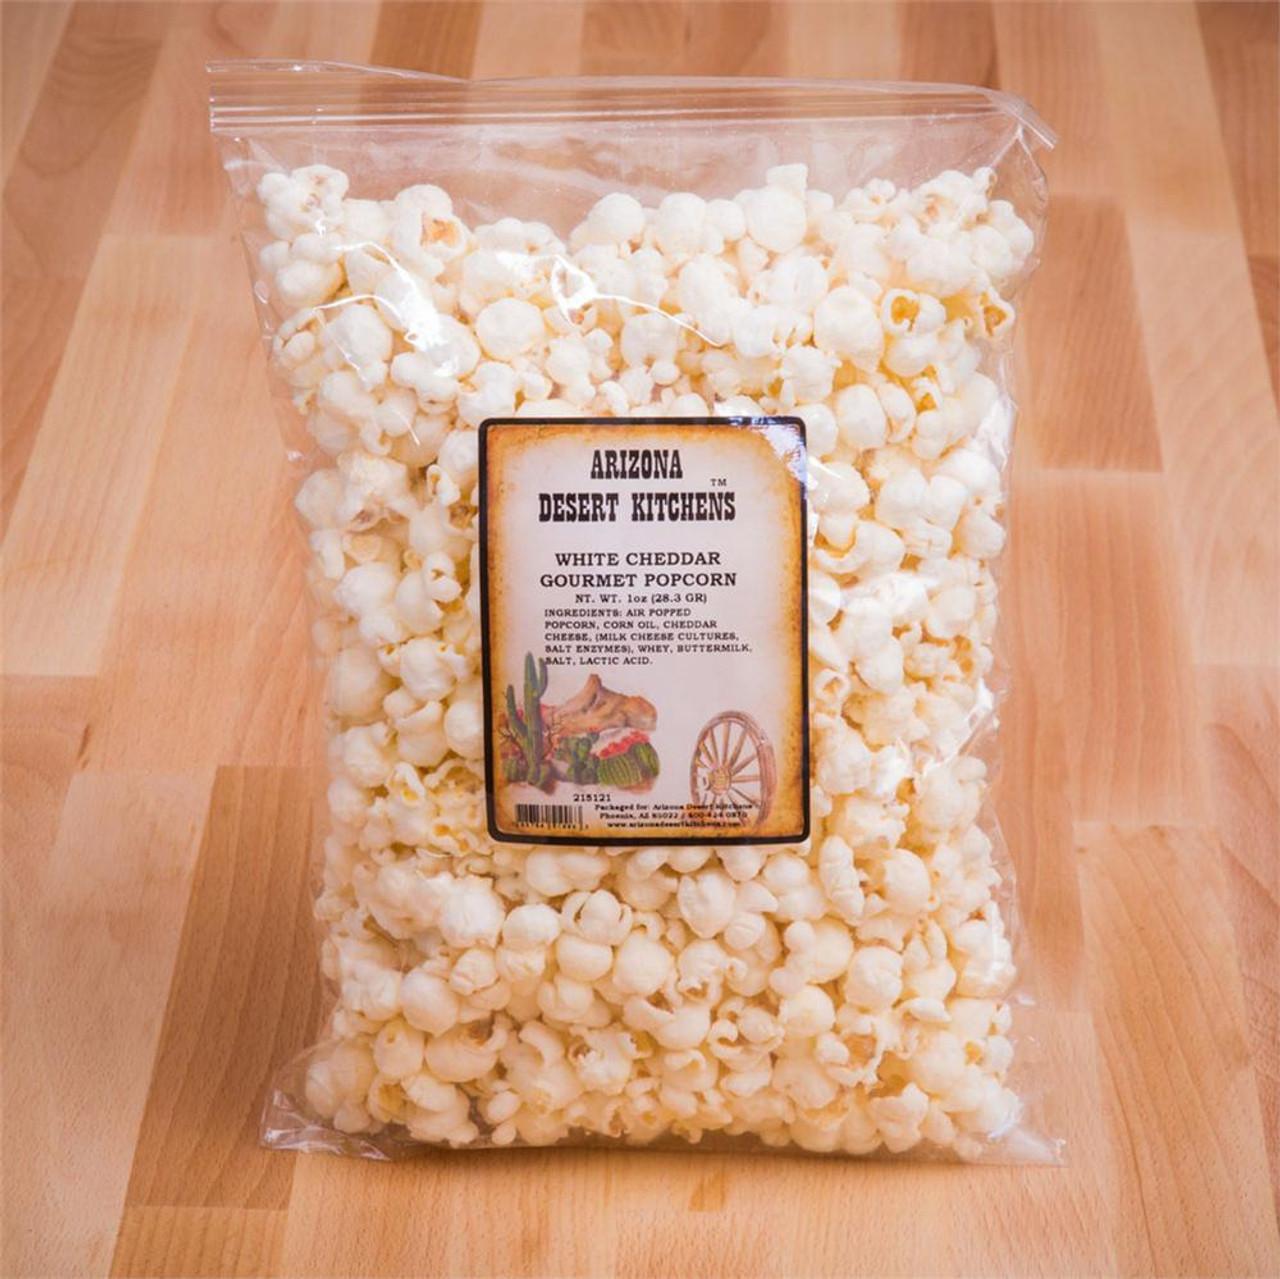 White Cheddar Gourmet Popcorn 3oz